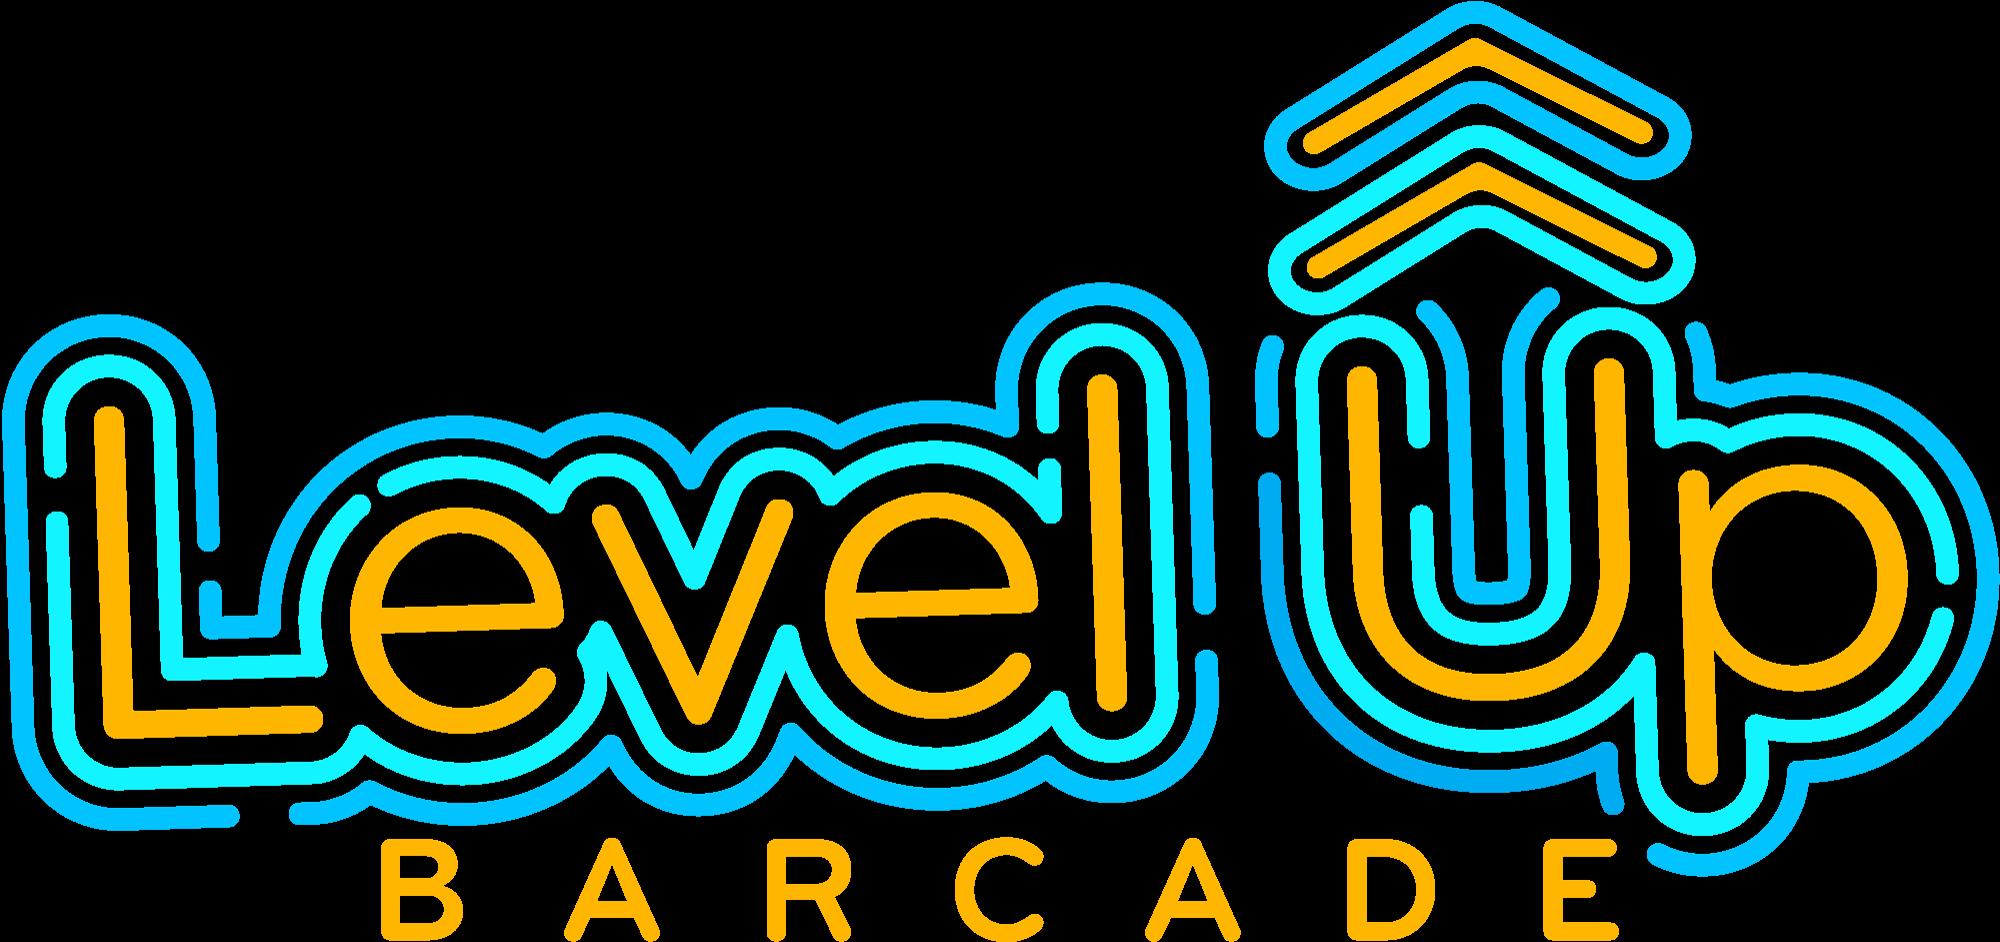 fun-activity-logo-levelup